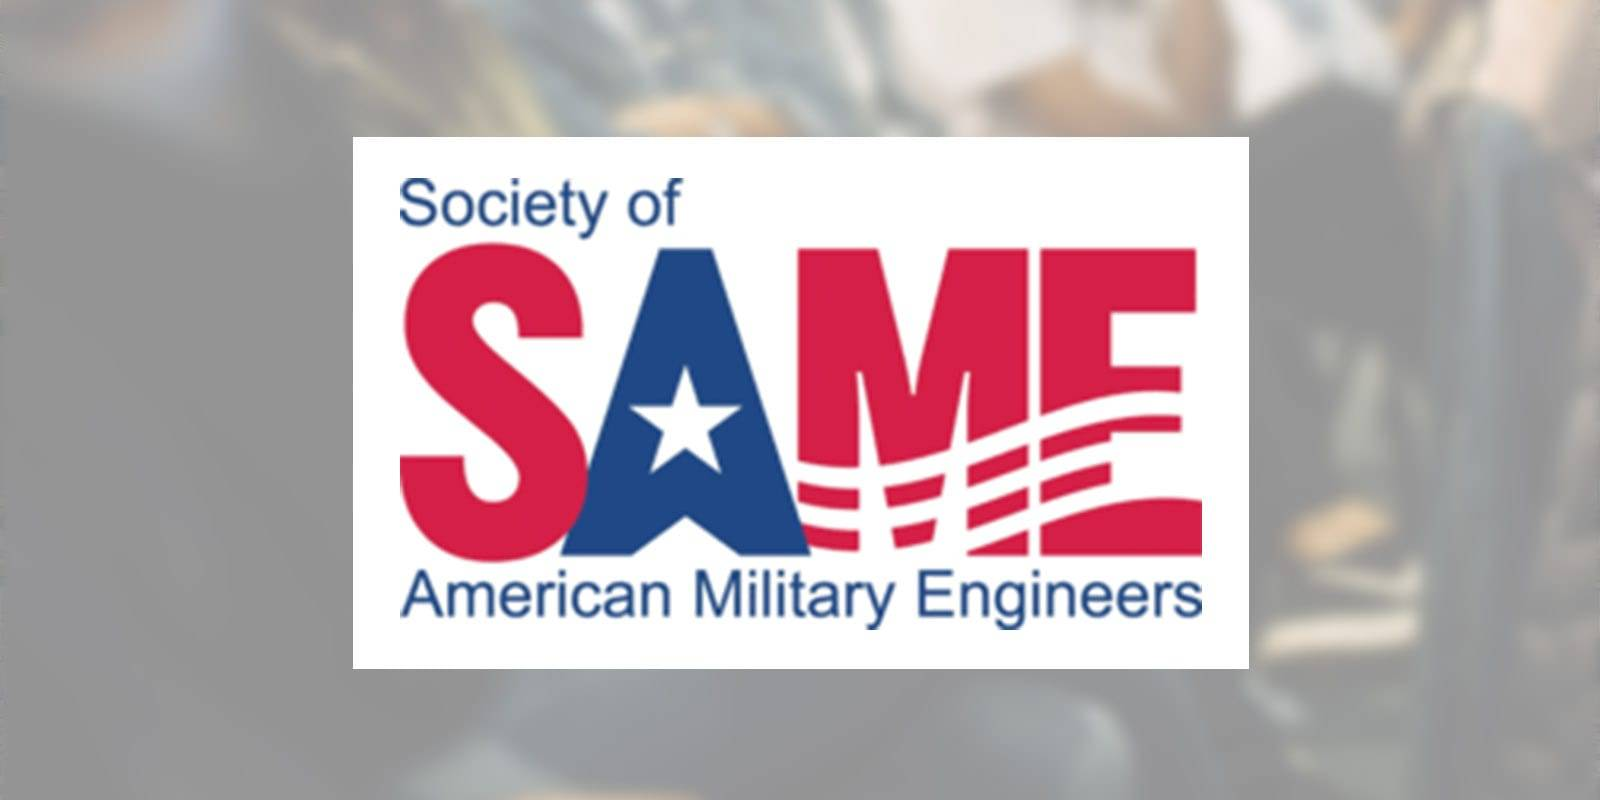 Society of American Military Engineers logo